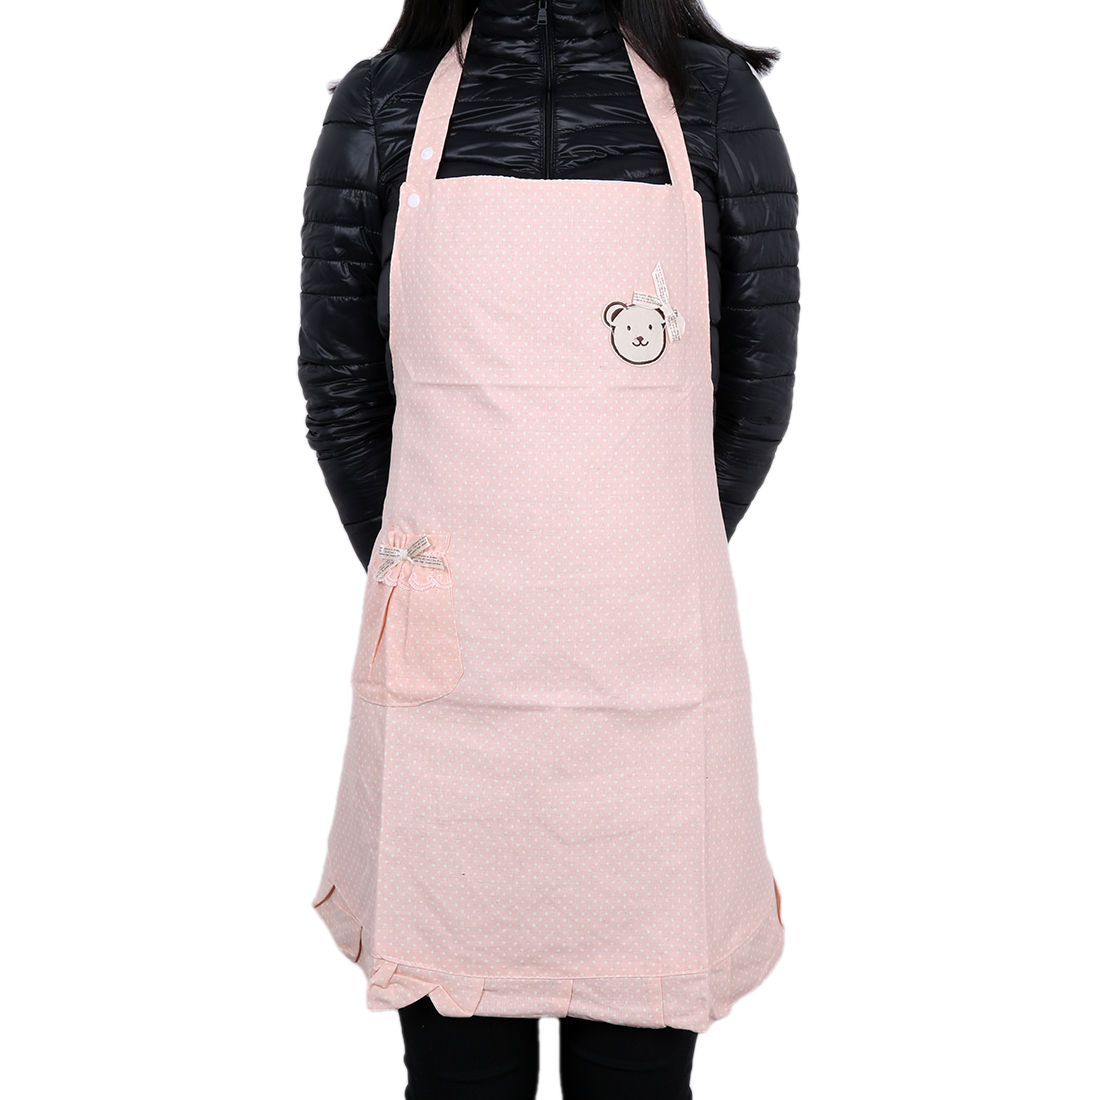 Polka Dot Pink Cooking Plain Butchers Kitchen Apron with Pocket Pink